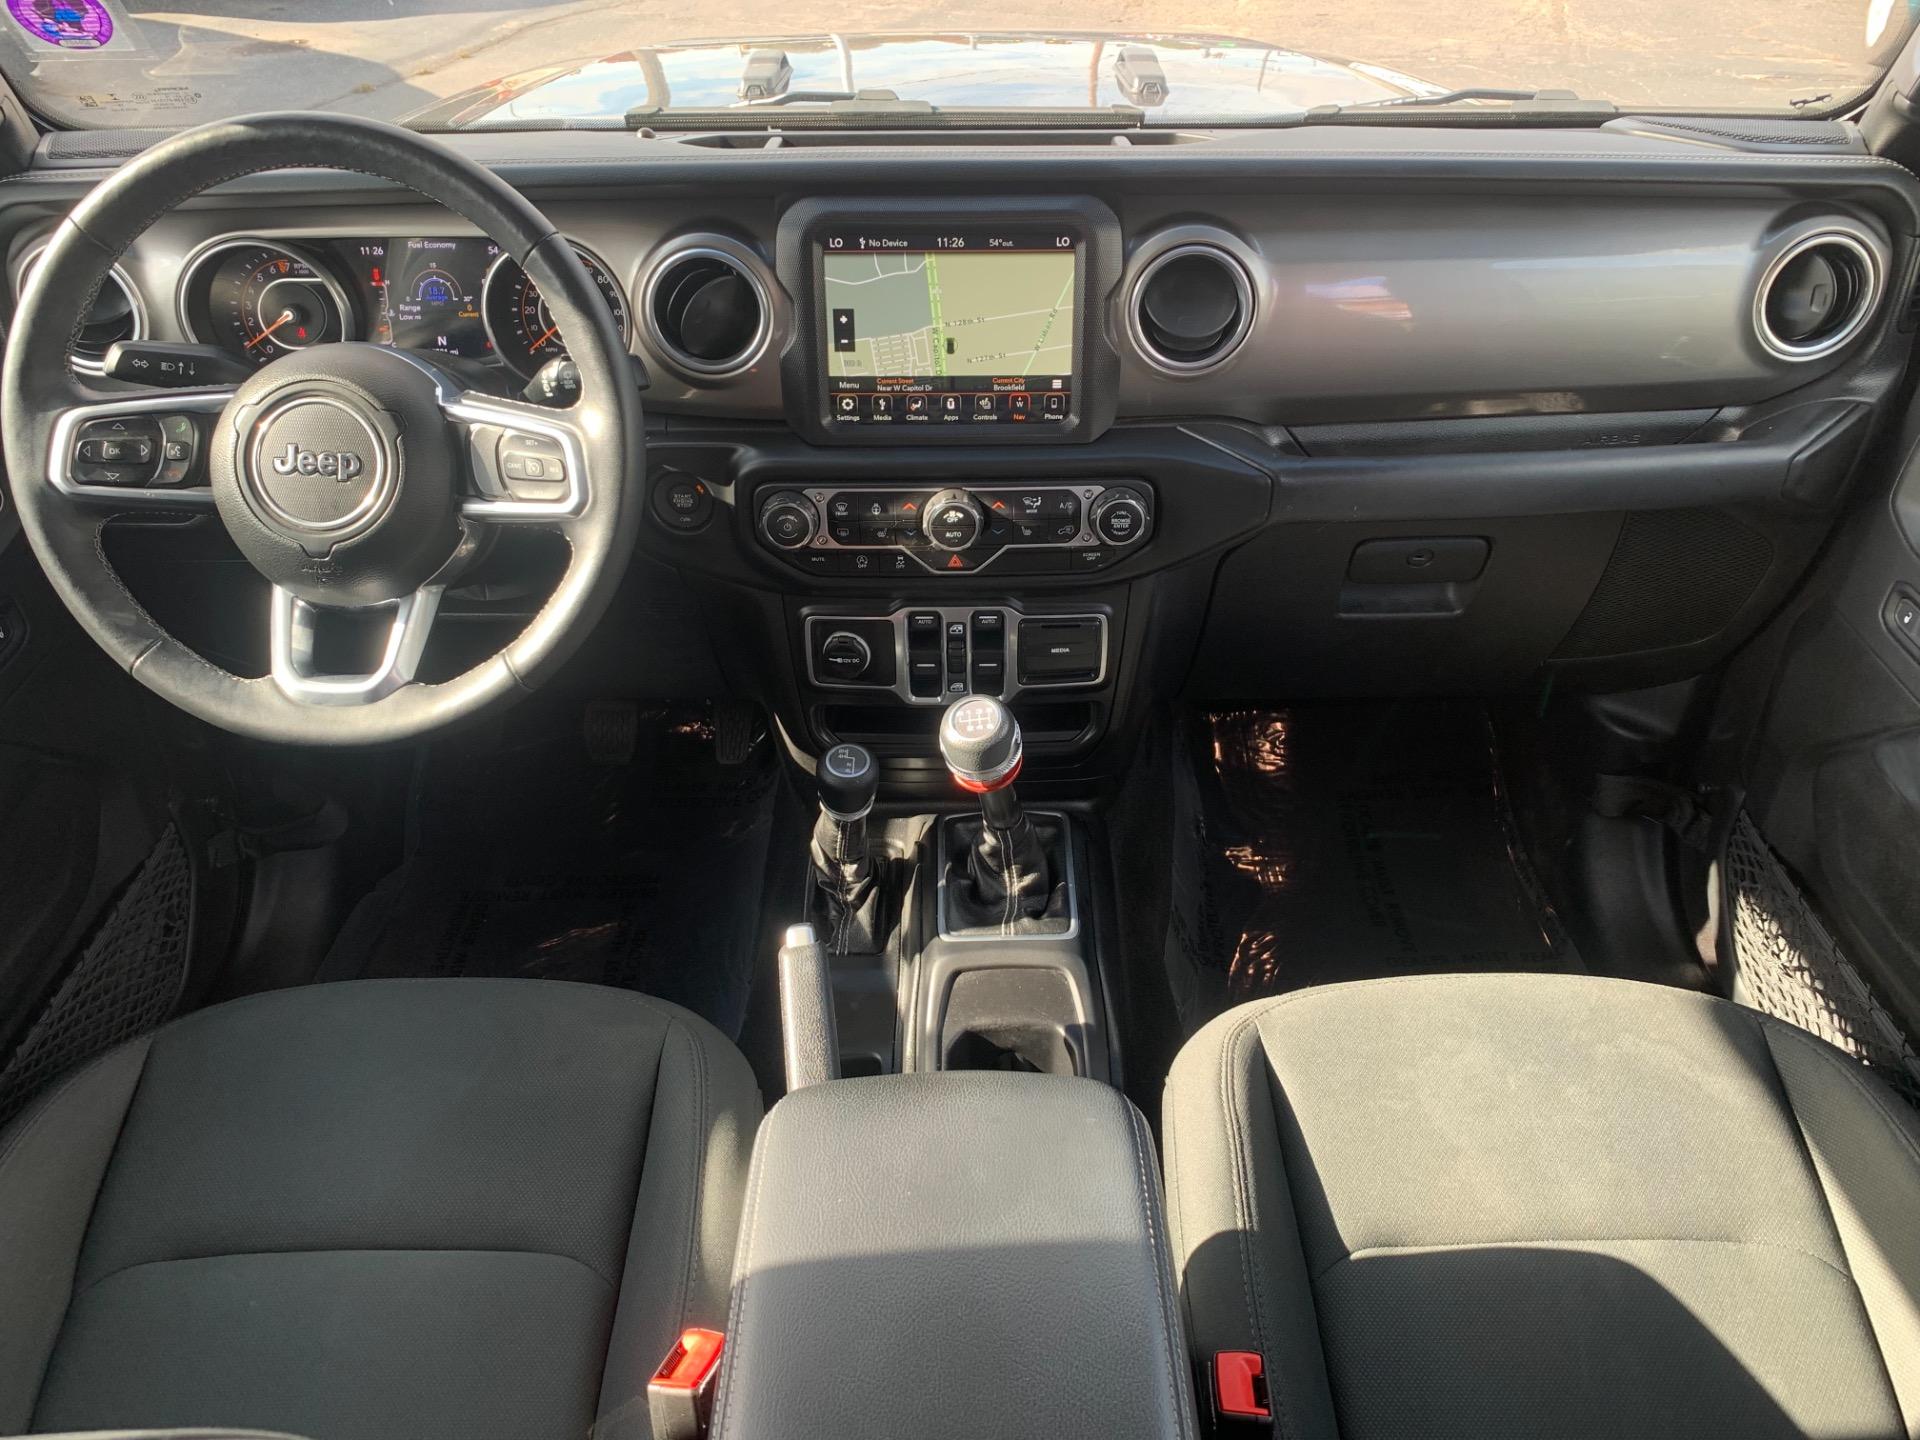 Used-2018-Jeep-Wrangler-Unlimited-Sahara-4x4